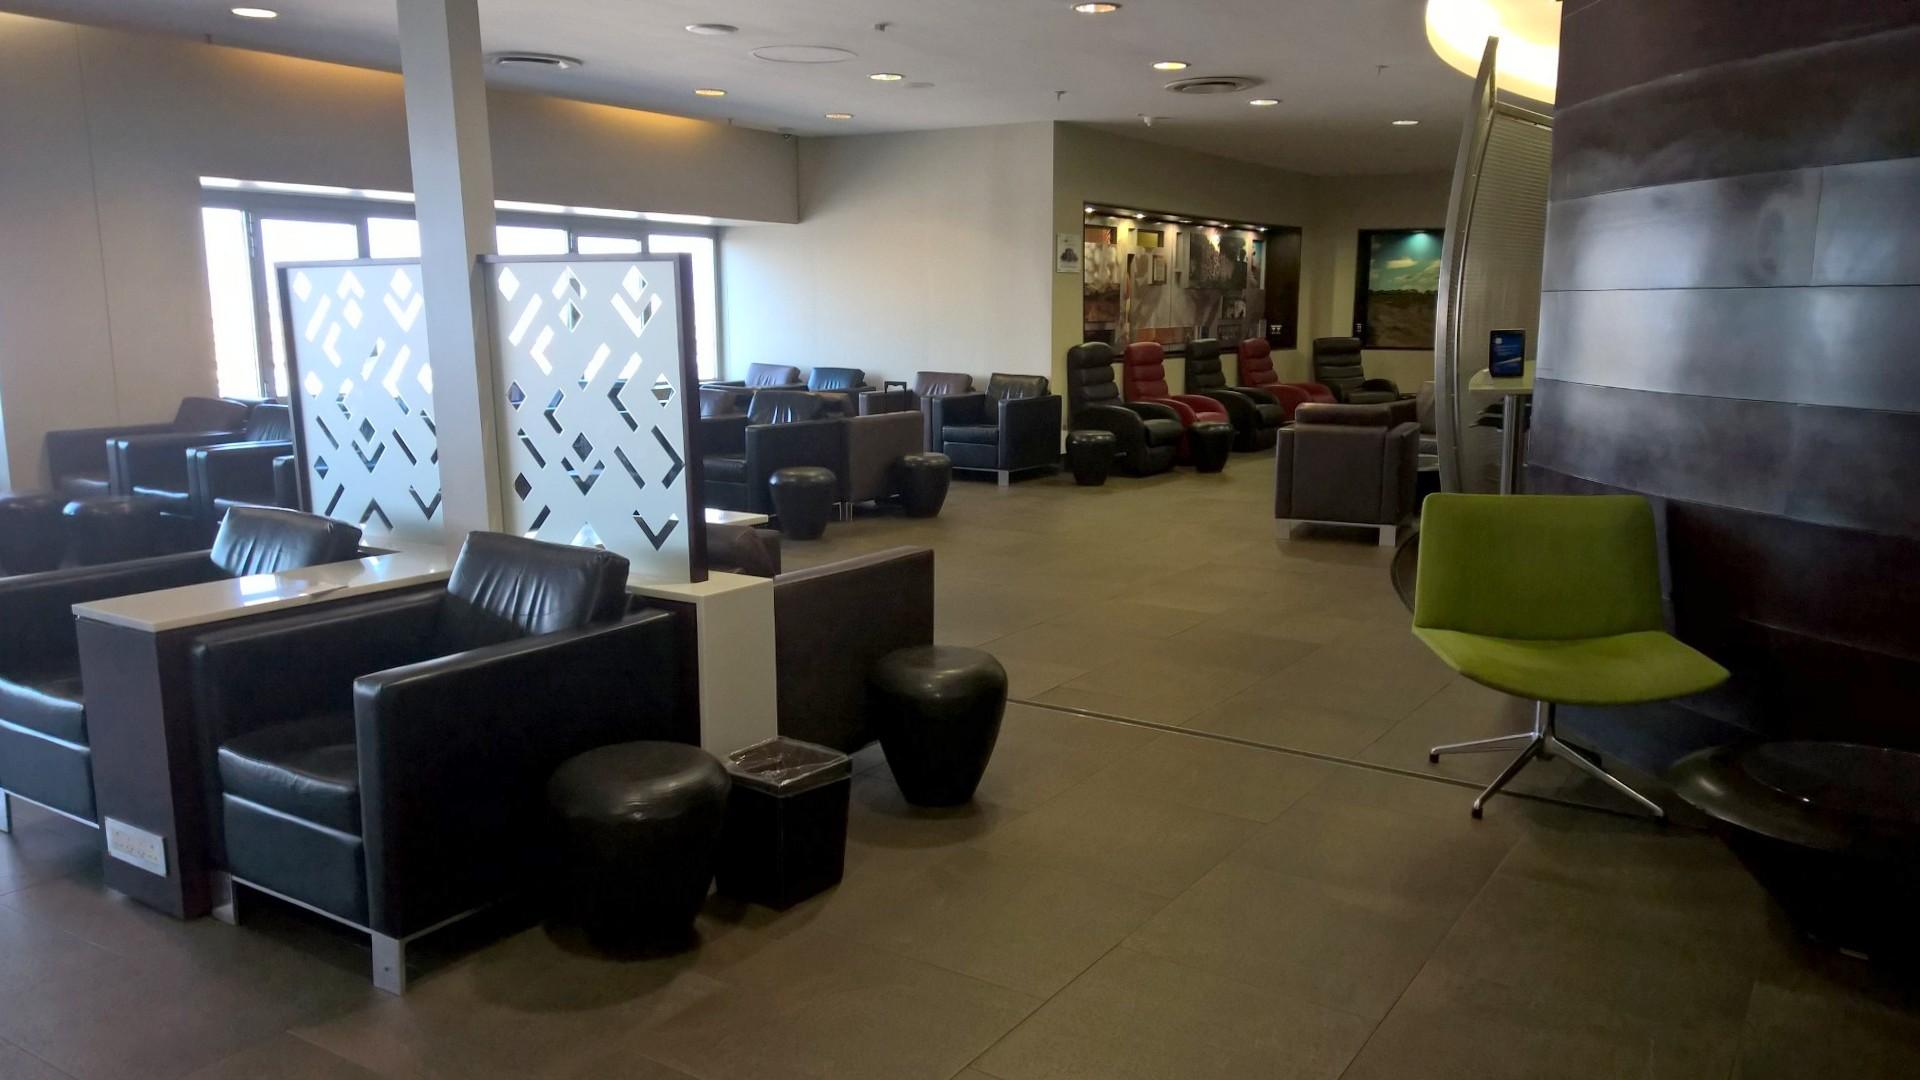 SAA Baobab Business Class Lounge Johannesburg